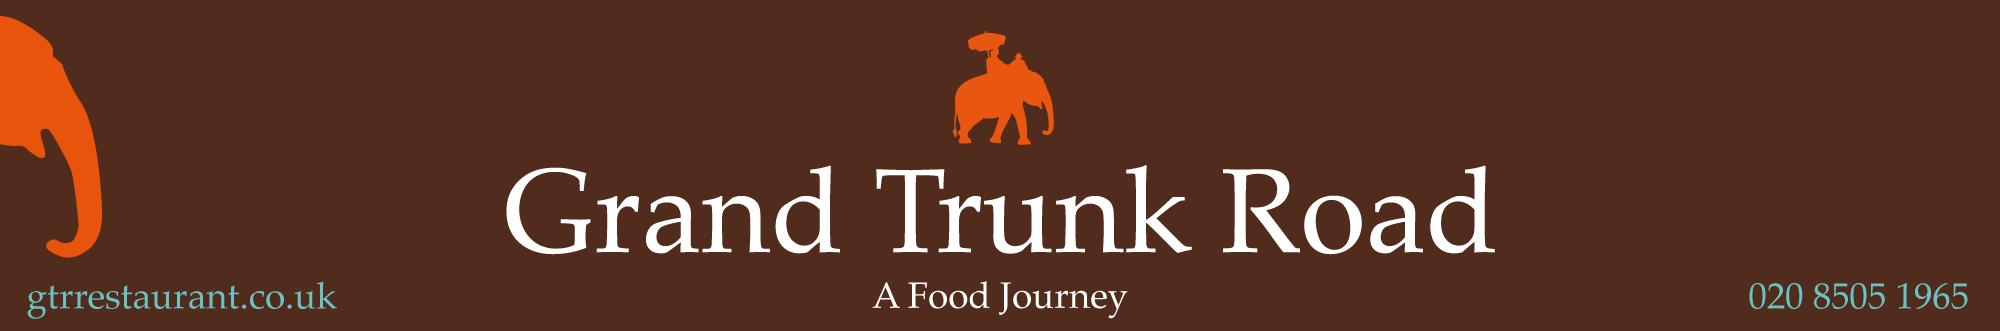 Grand Trunk Road Restaurant Signage